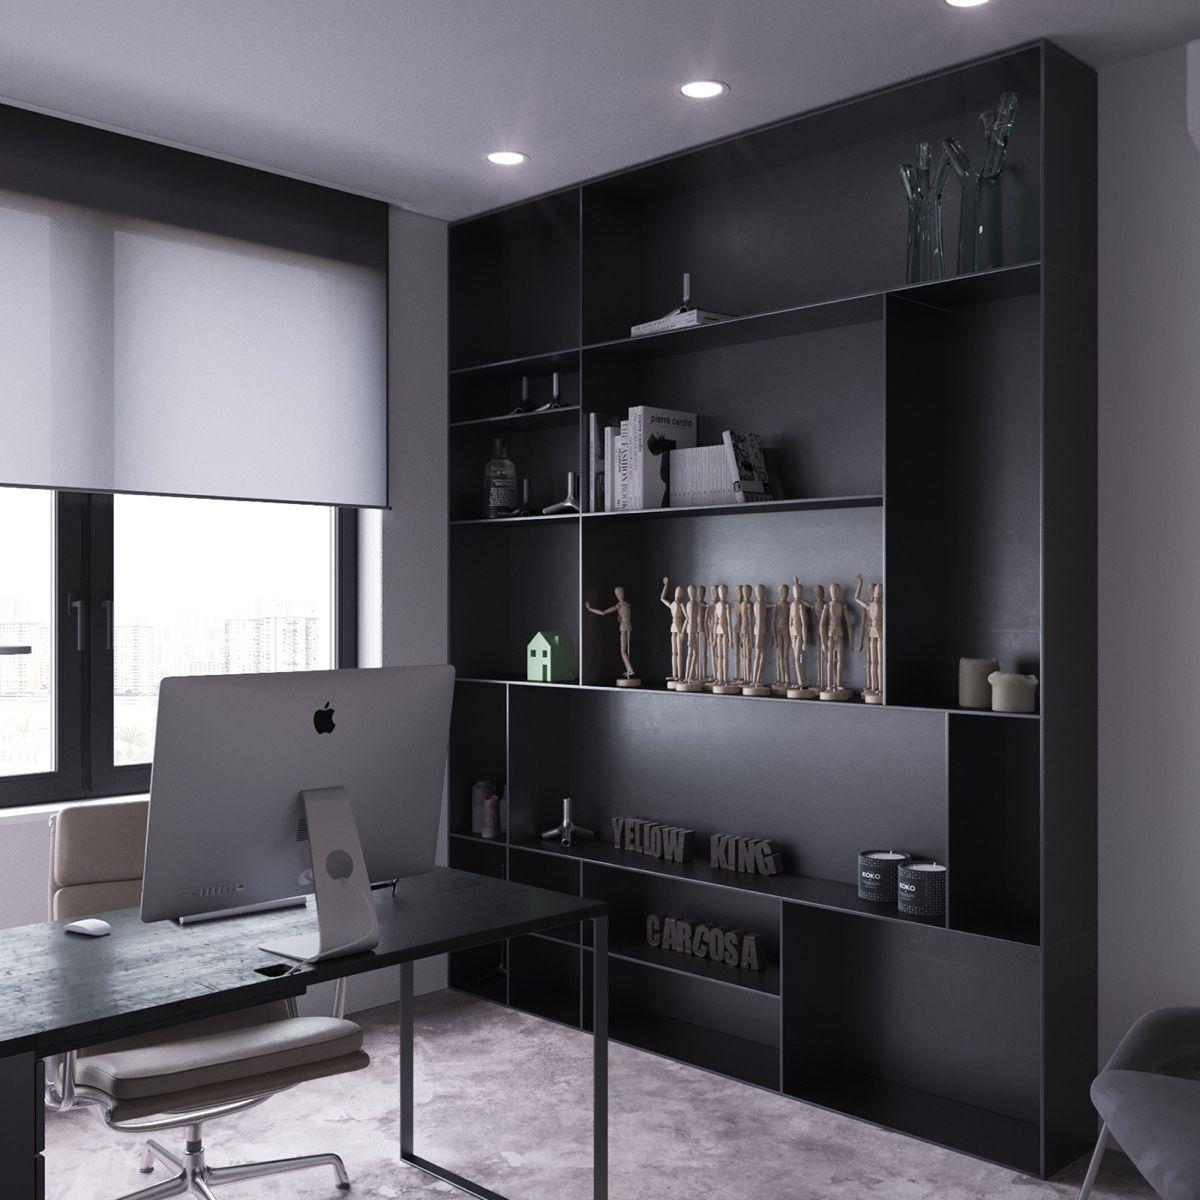 Dark Moody Bachelor Pad Design: 2 Single Bedroom L-Shaped